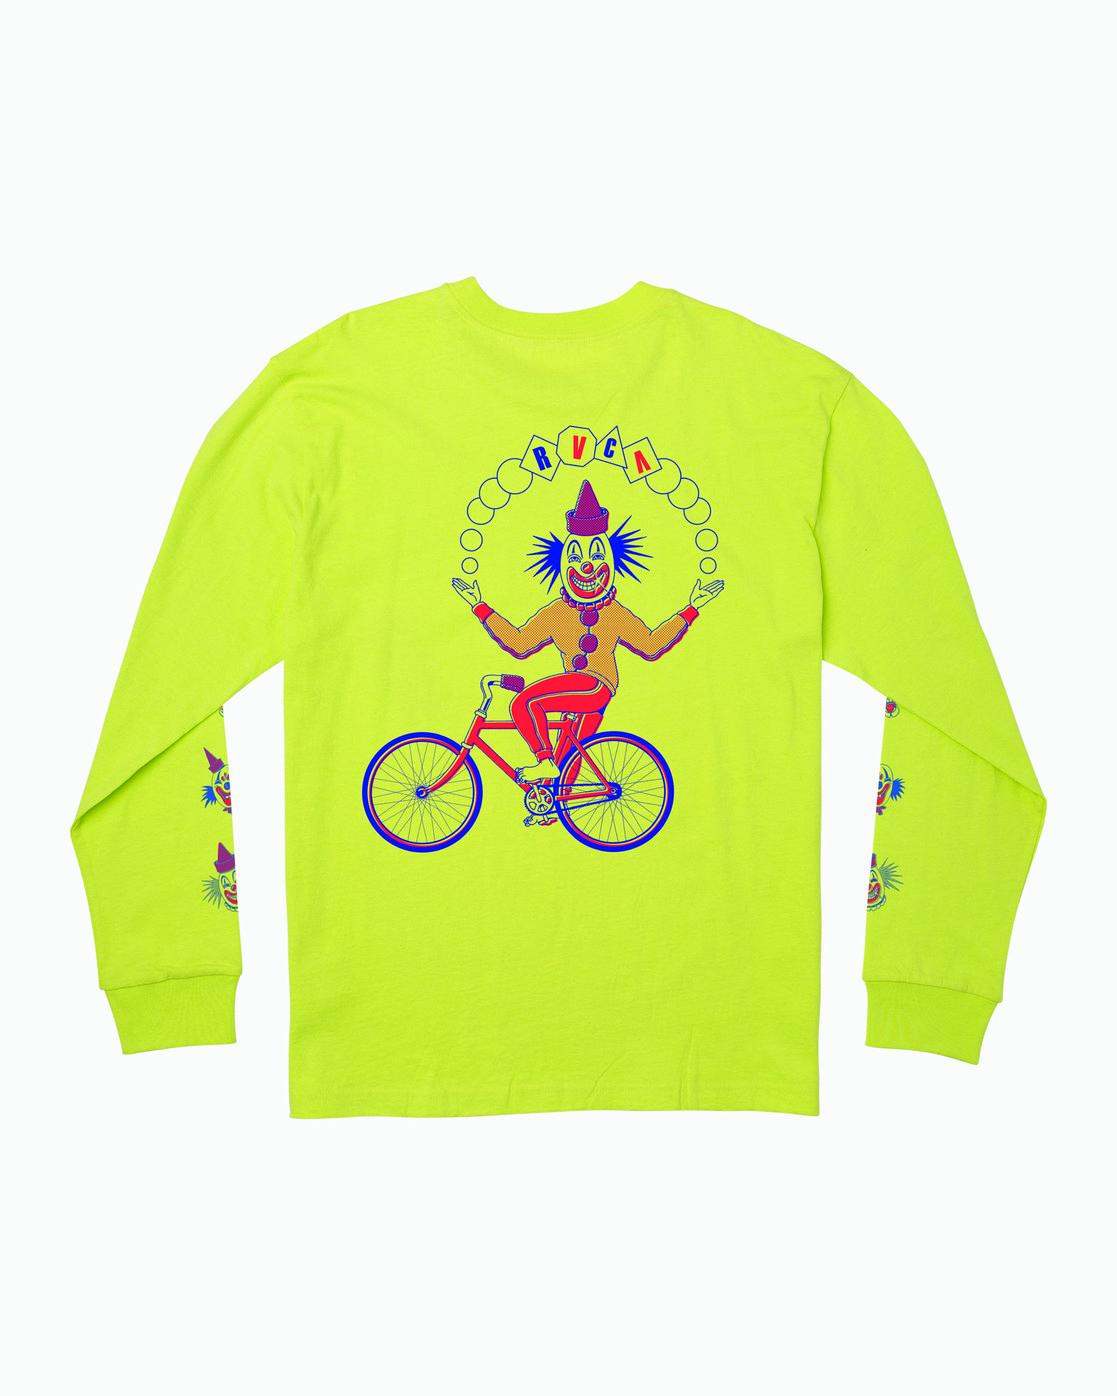 0 Big Top Long Sleeve T-Shirt Yellow M492WRBT RVCA